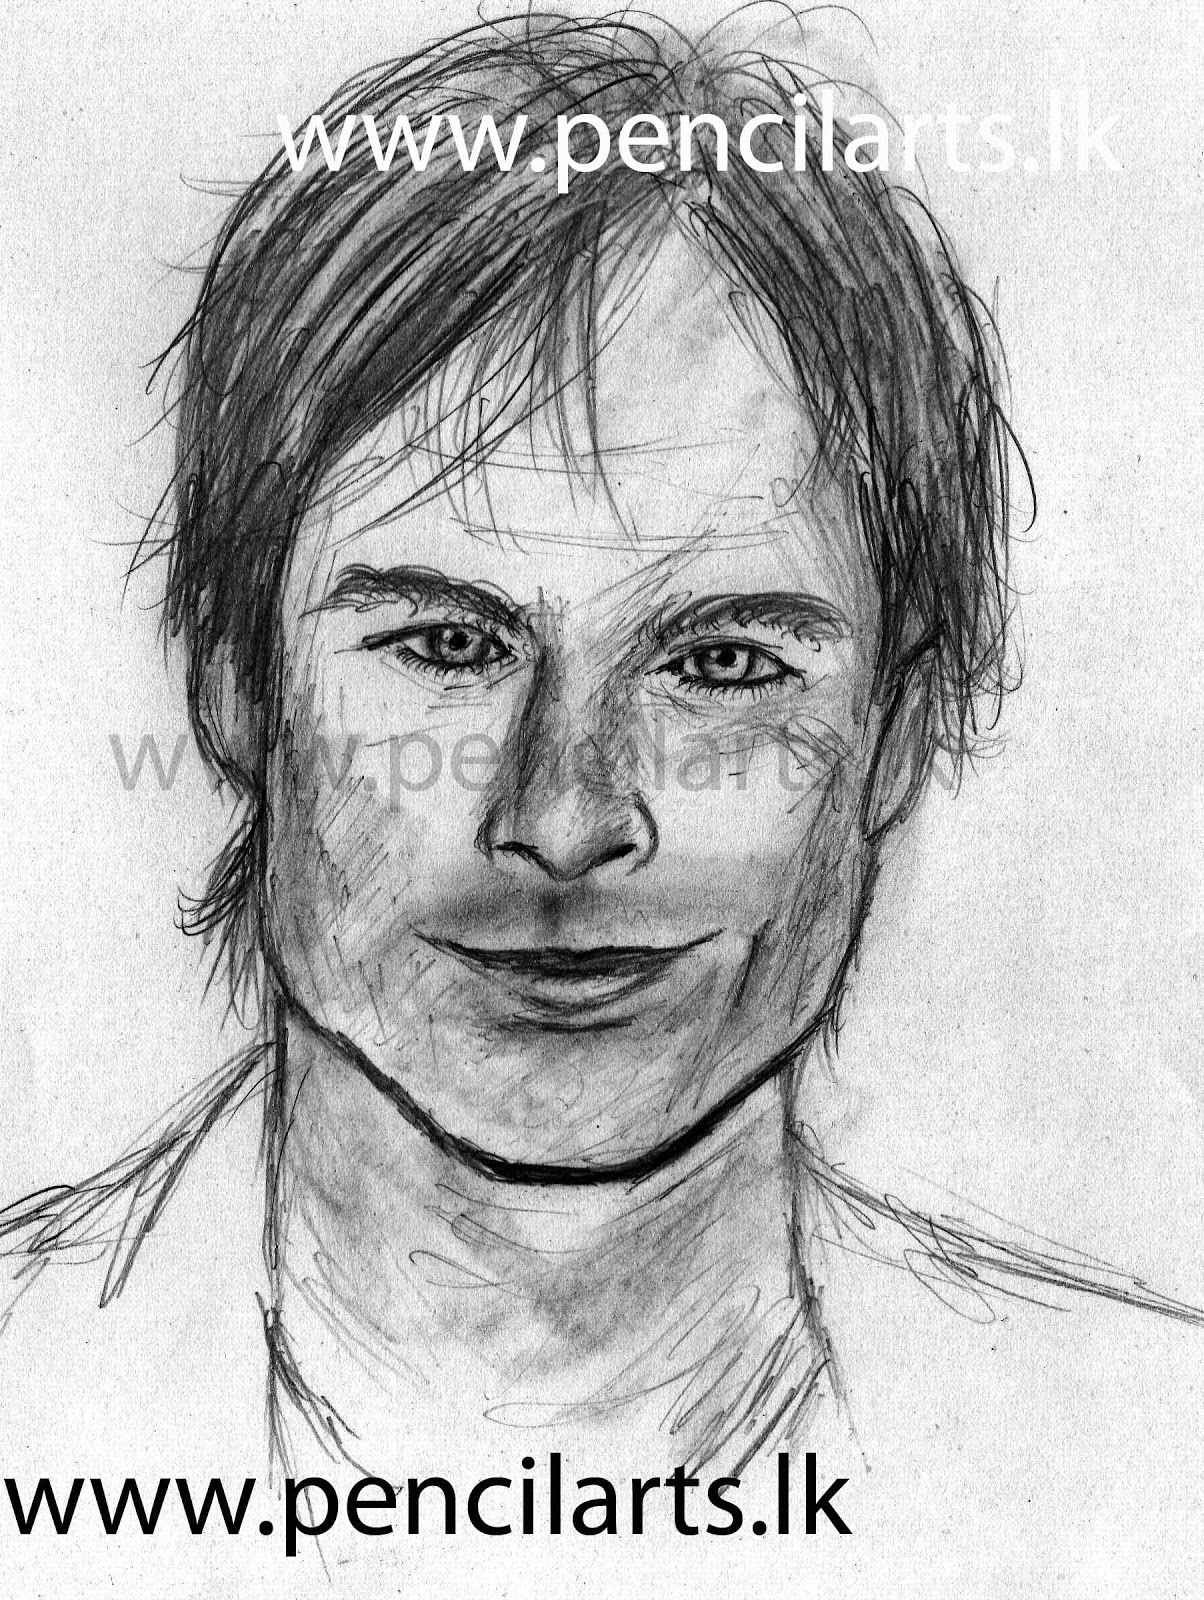 http://2.bp.blogspot.com/-3HQE3OGWYwo/UMOpGgjEpRI/AAAAAAAAAhU/wJfJvRQXbg8/s1600/Ian-Somerhalder--the-vampire-diaries-actor-2.jpg